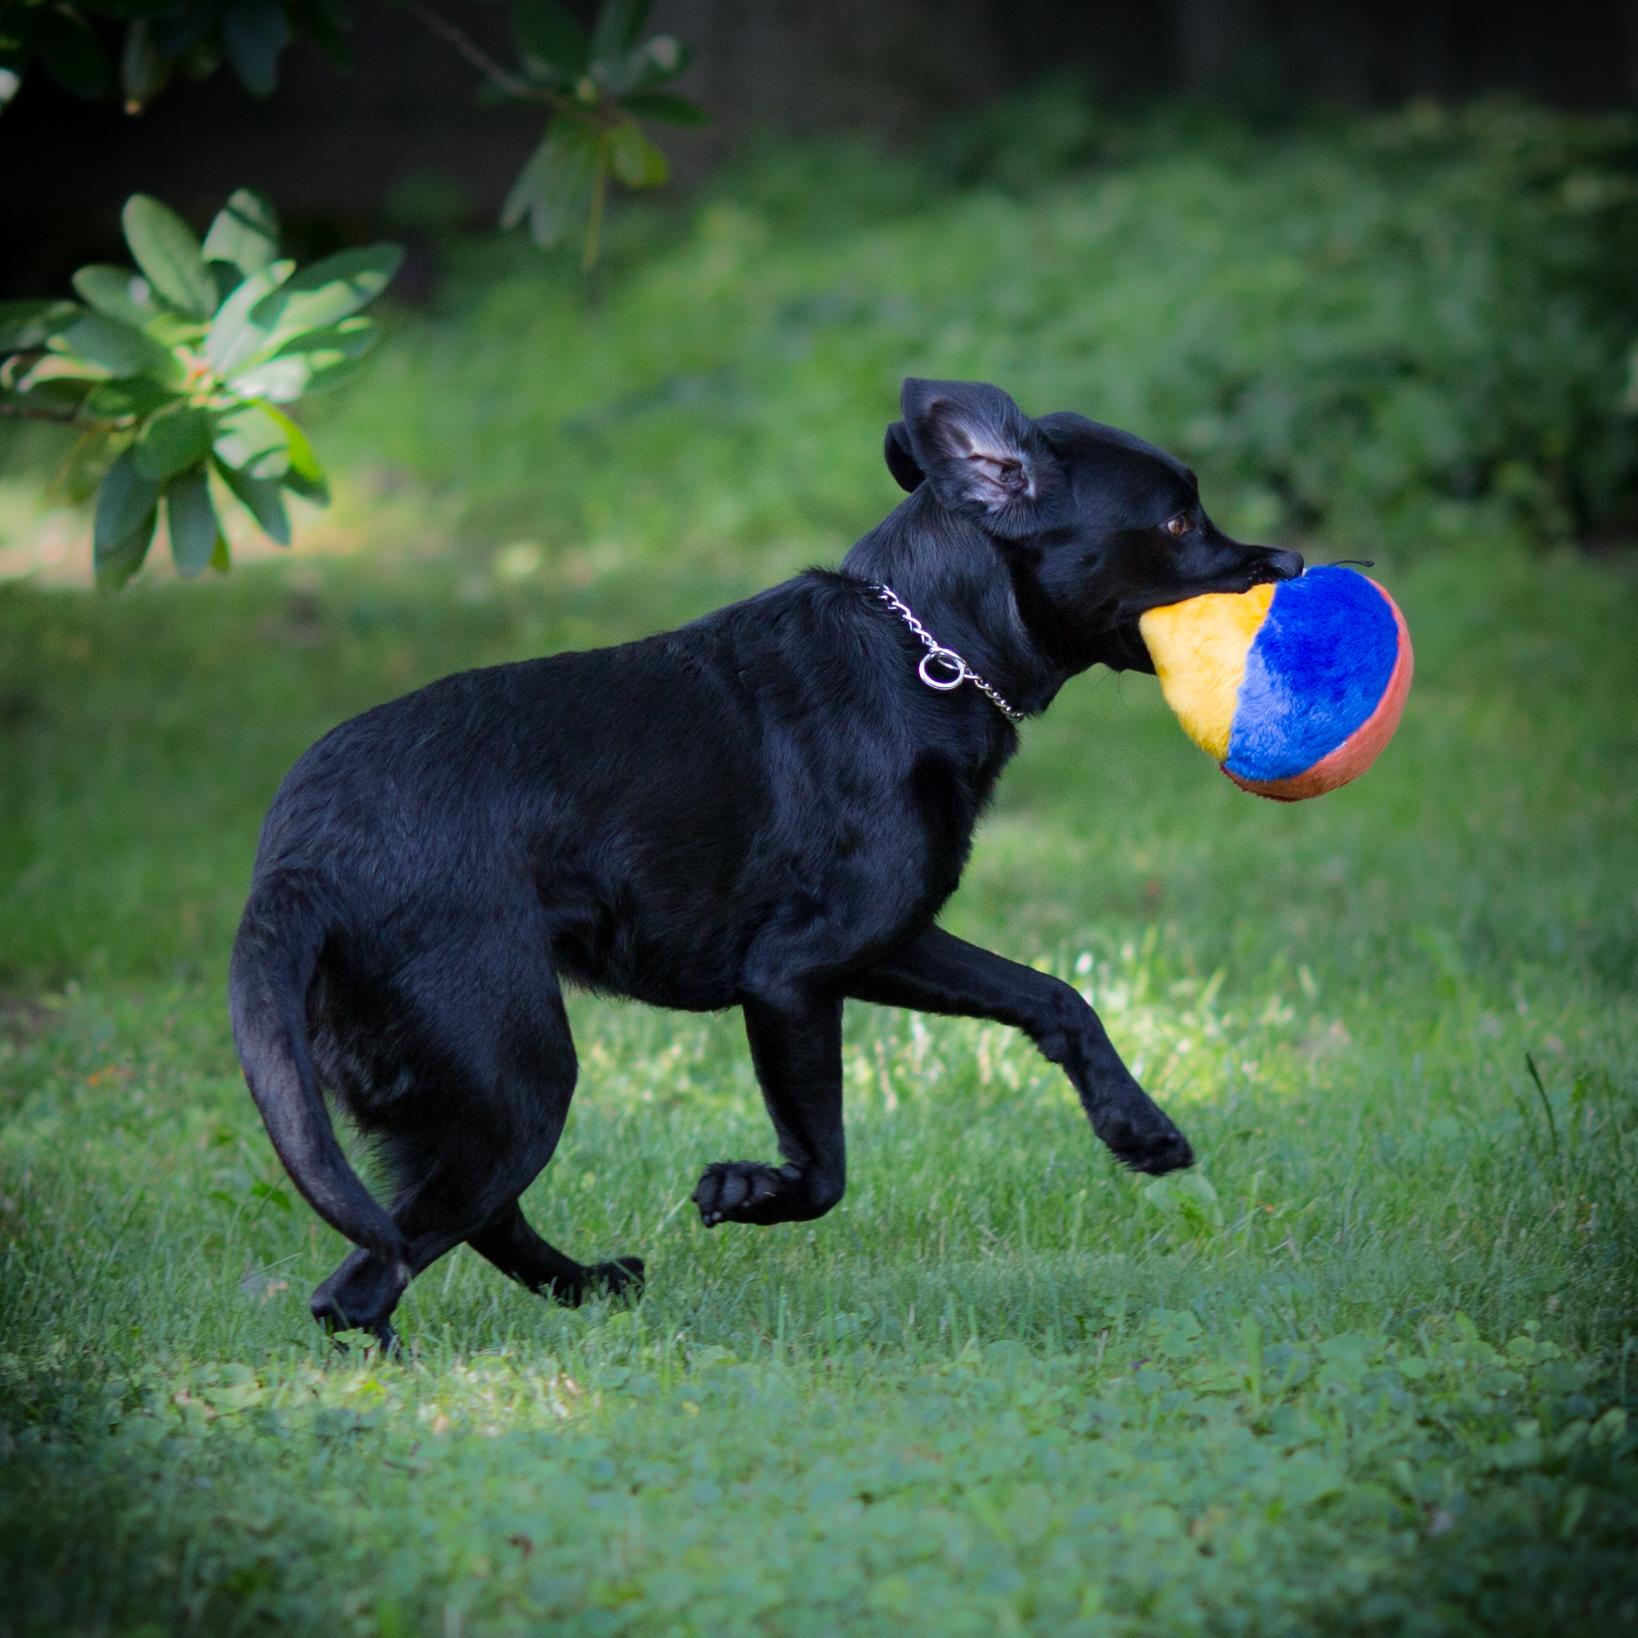 A black Lab chases a colorful plush beach ball